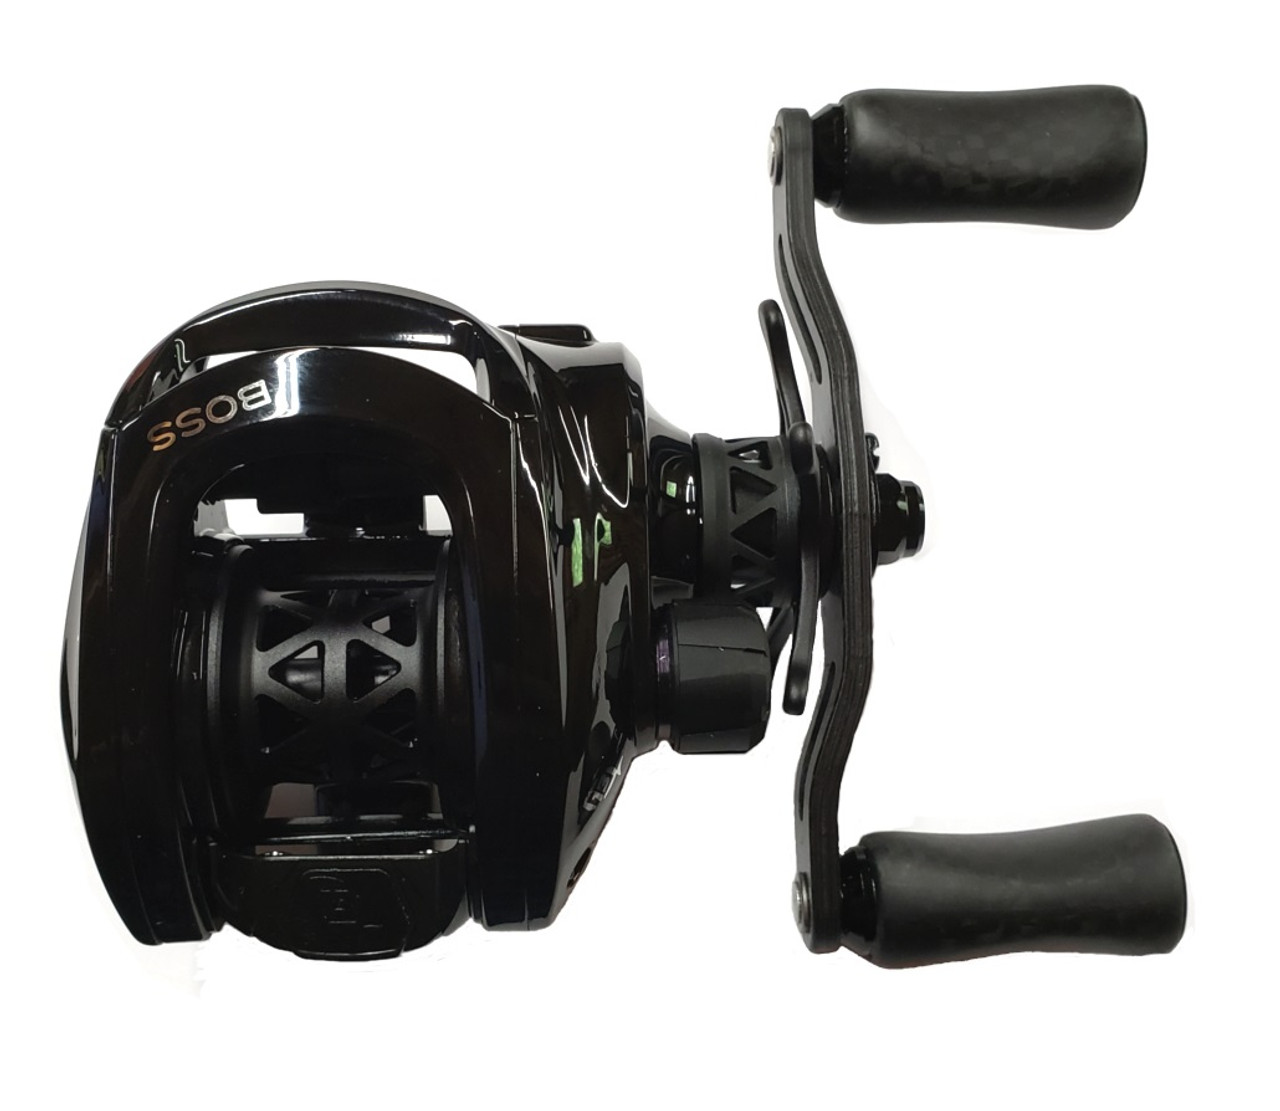 13 Fishing Concept BOSS Bait Casting Reel